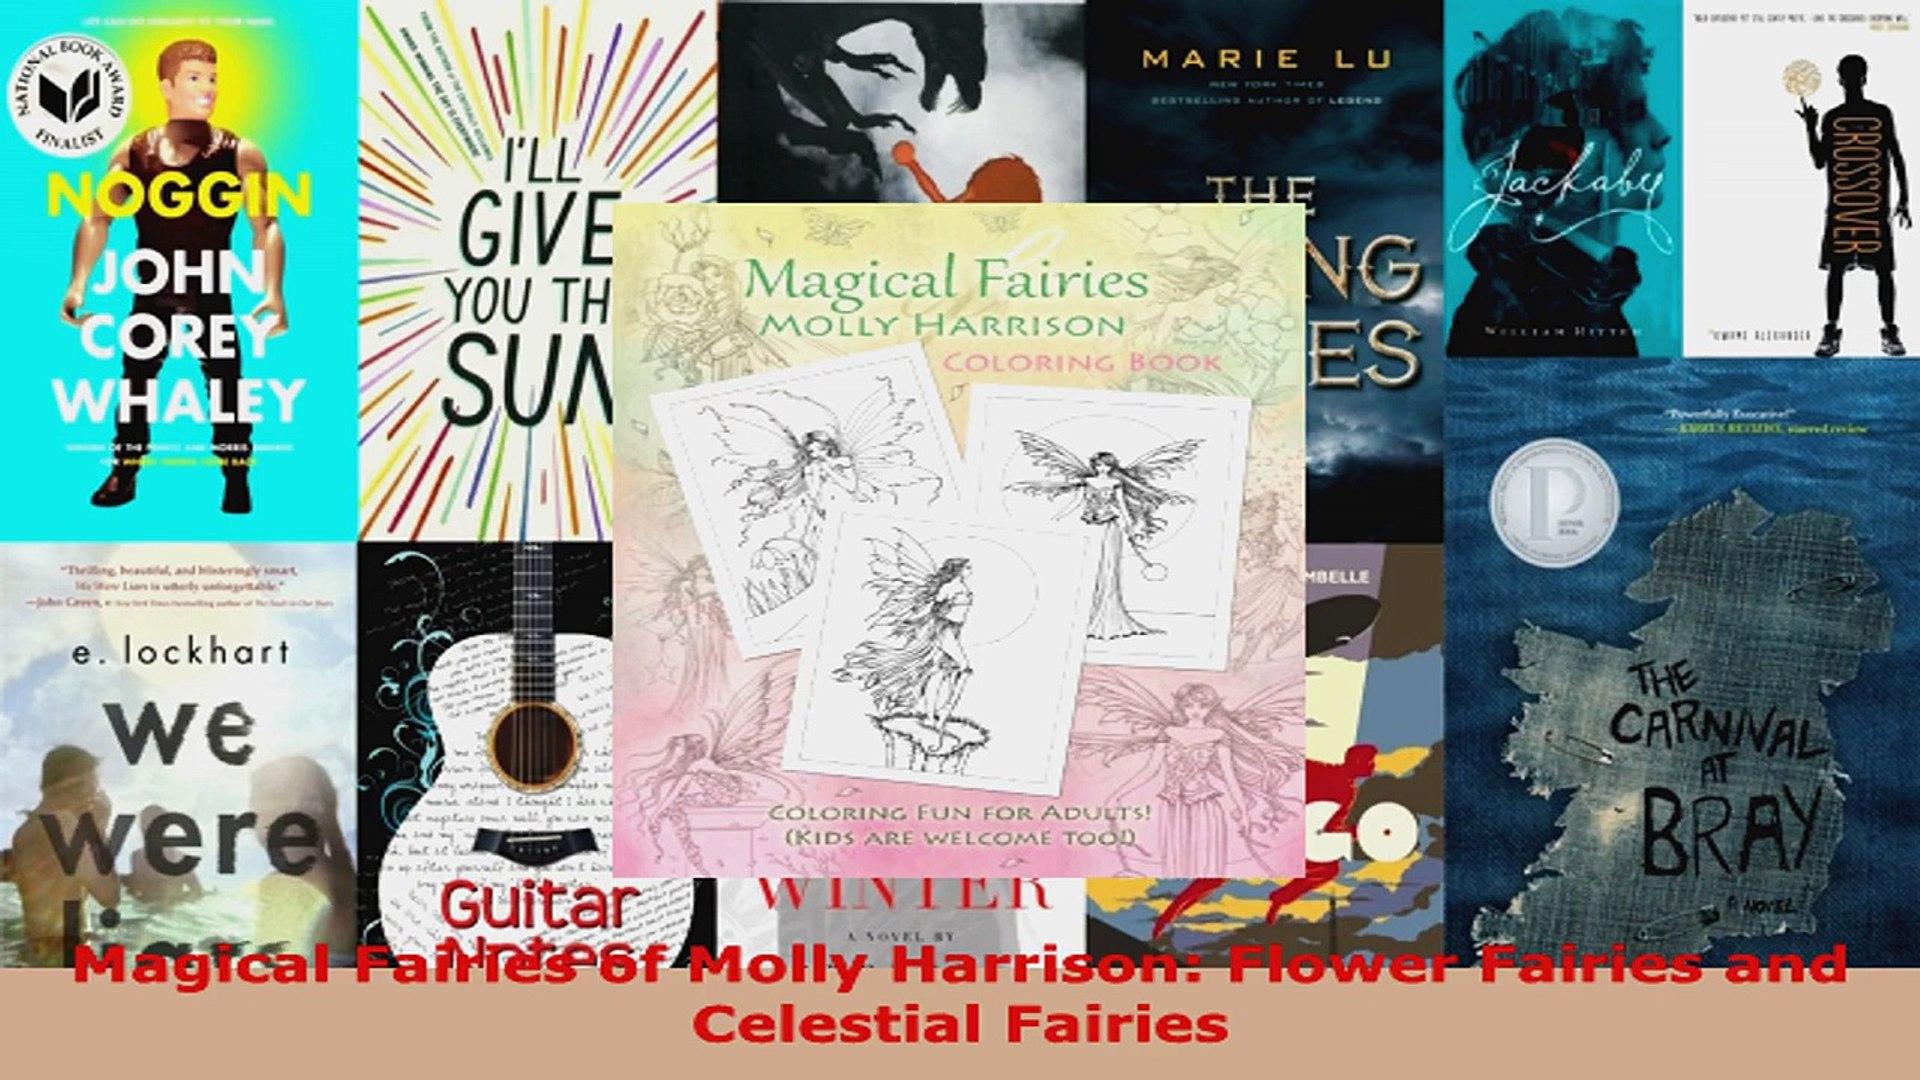 Download  Magical Fairies of Molly Harrison Flower Fairies and Celestial Fairies PDF Online